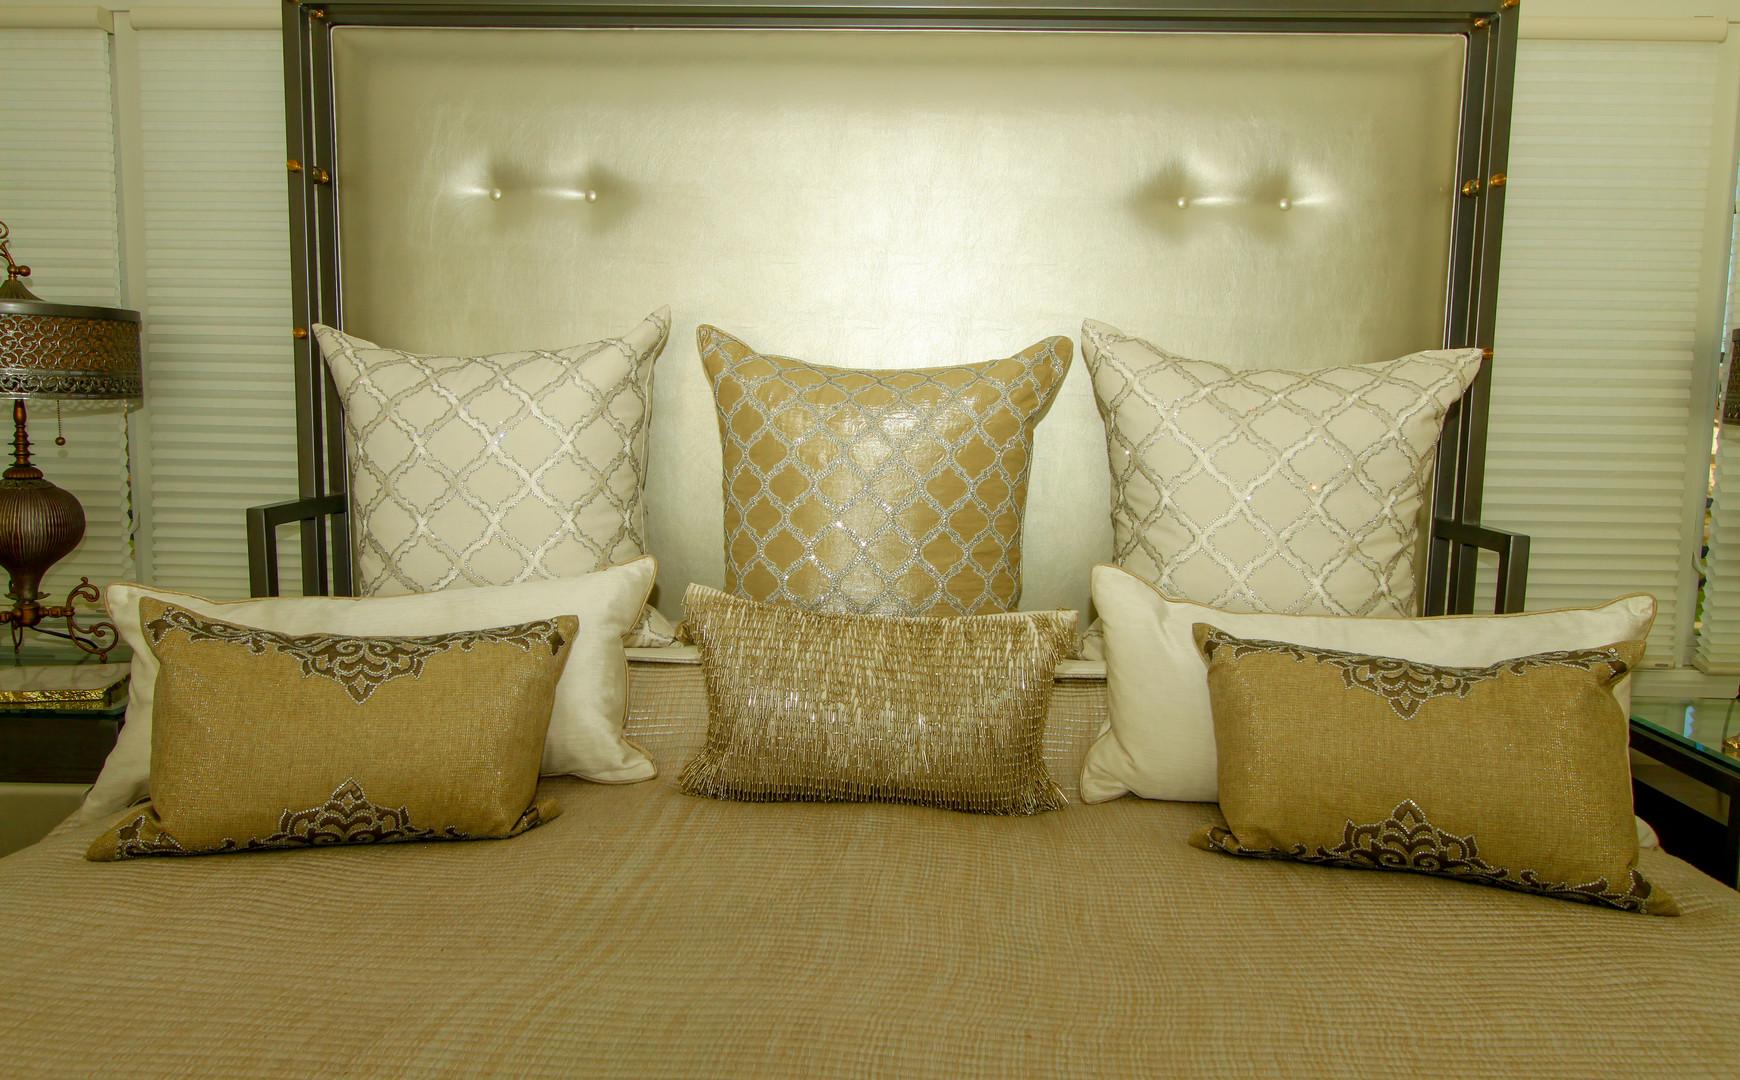 Master Bedroom Pillow Accents.jpg